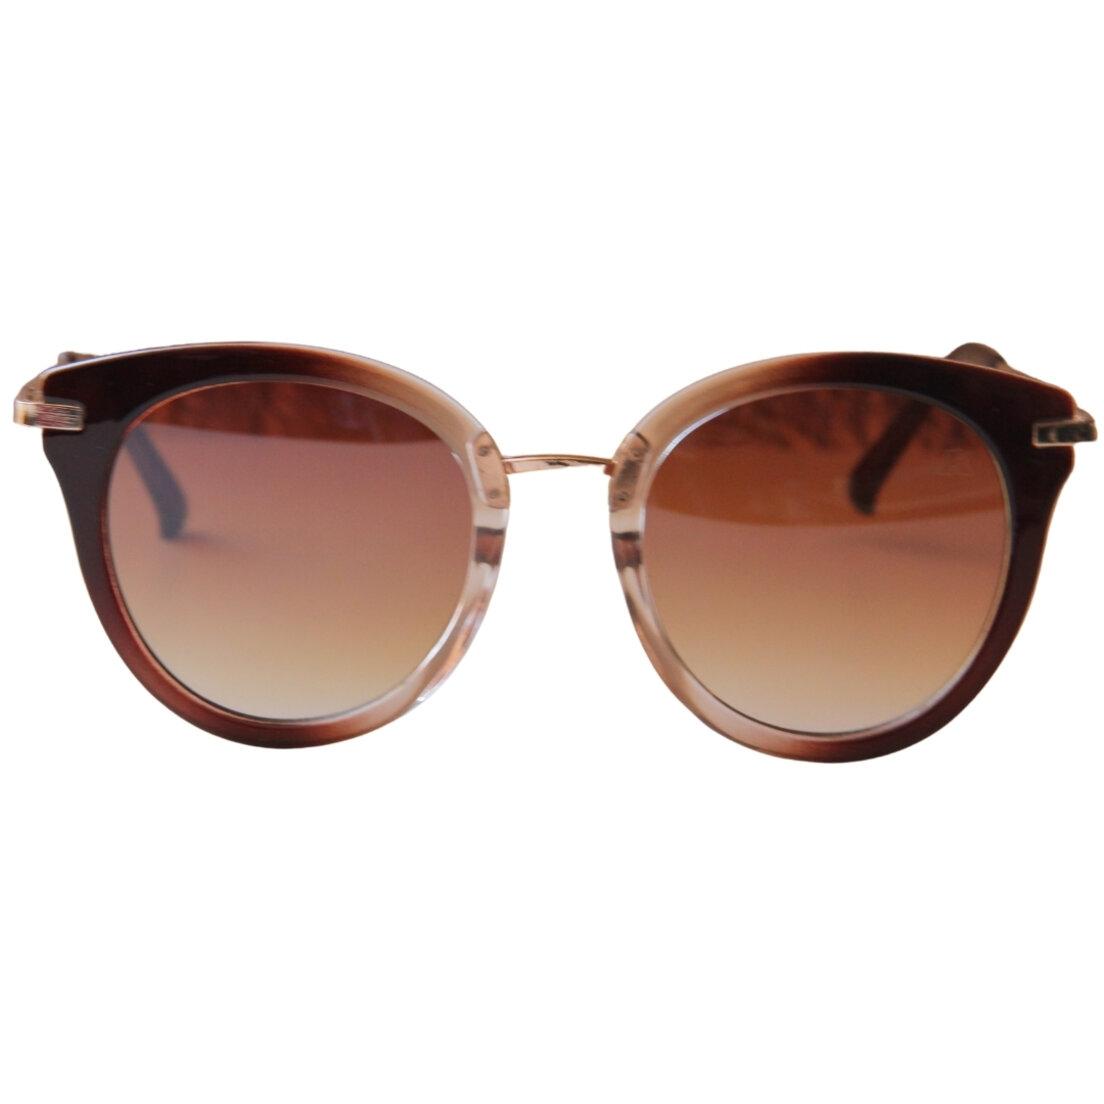 OUTLET - Óculos de Sol Khatto Round Cat -Marrom